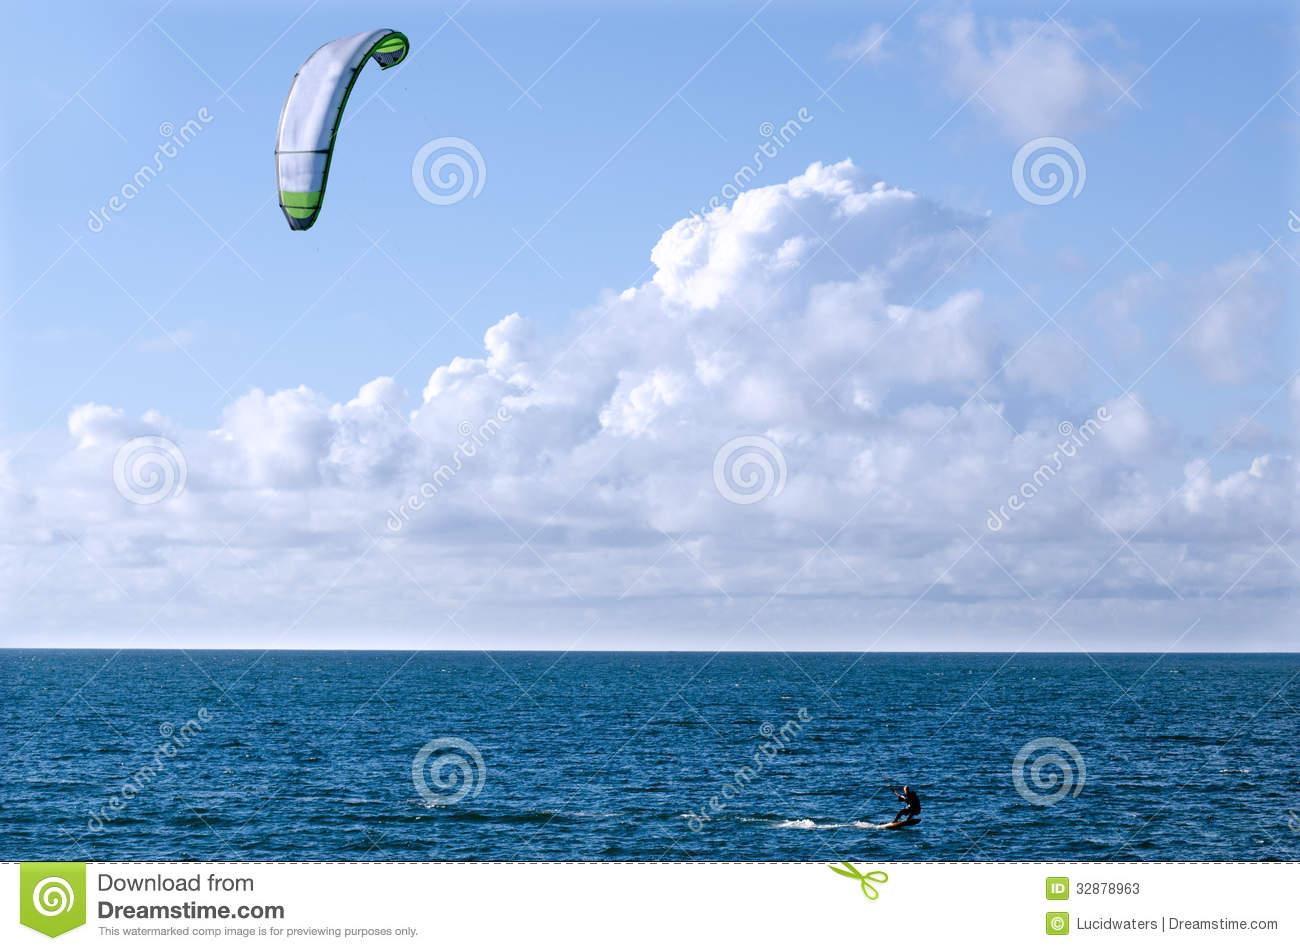 Kite Boarding Sea Sport Stock Photos.